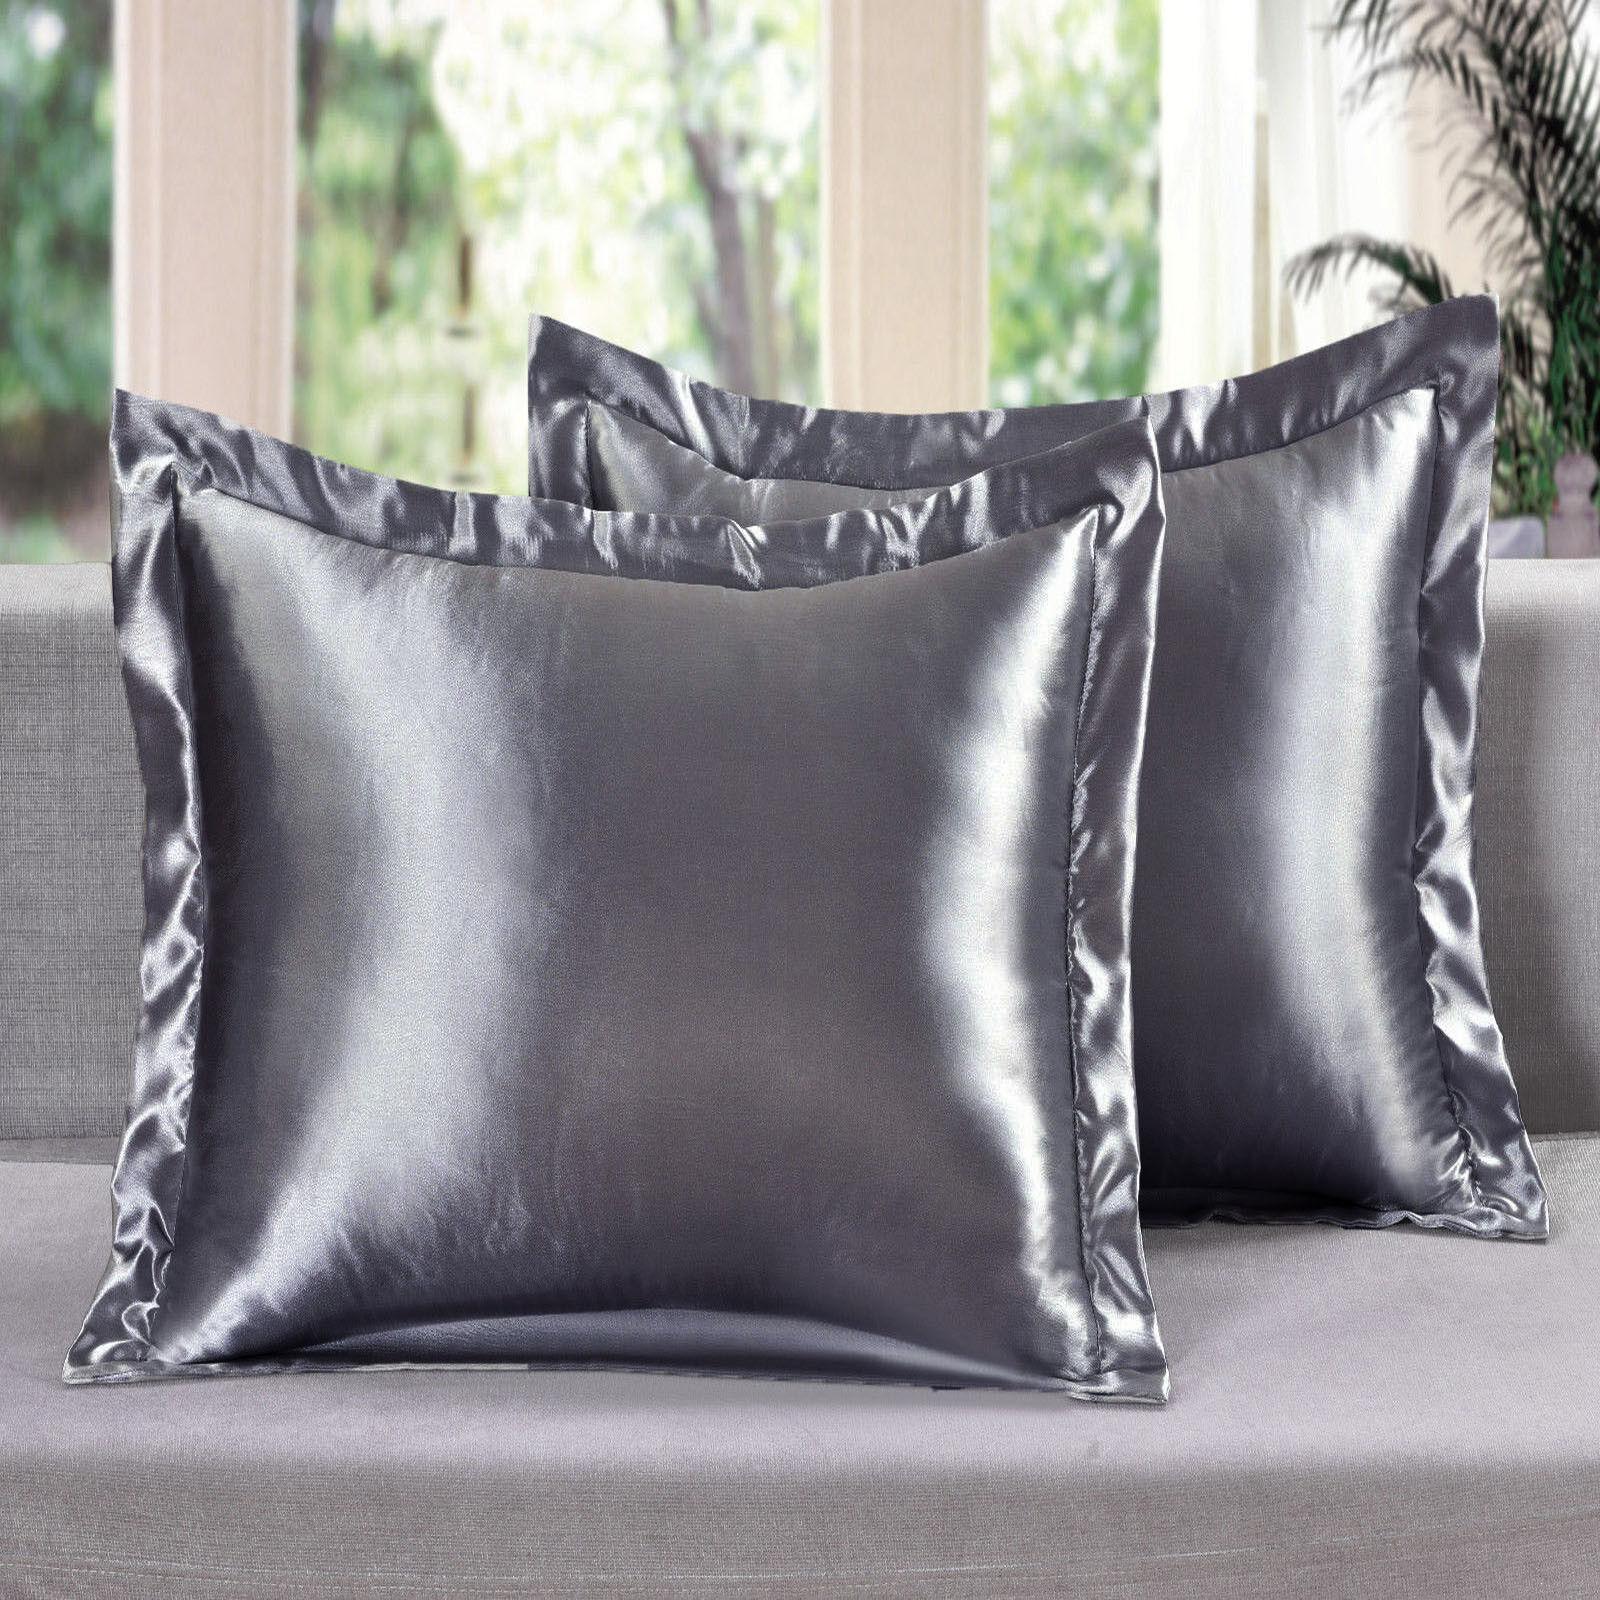 2 Piece Satin Euro Shams Solid Gray Cover Case Pillow AT Lin